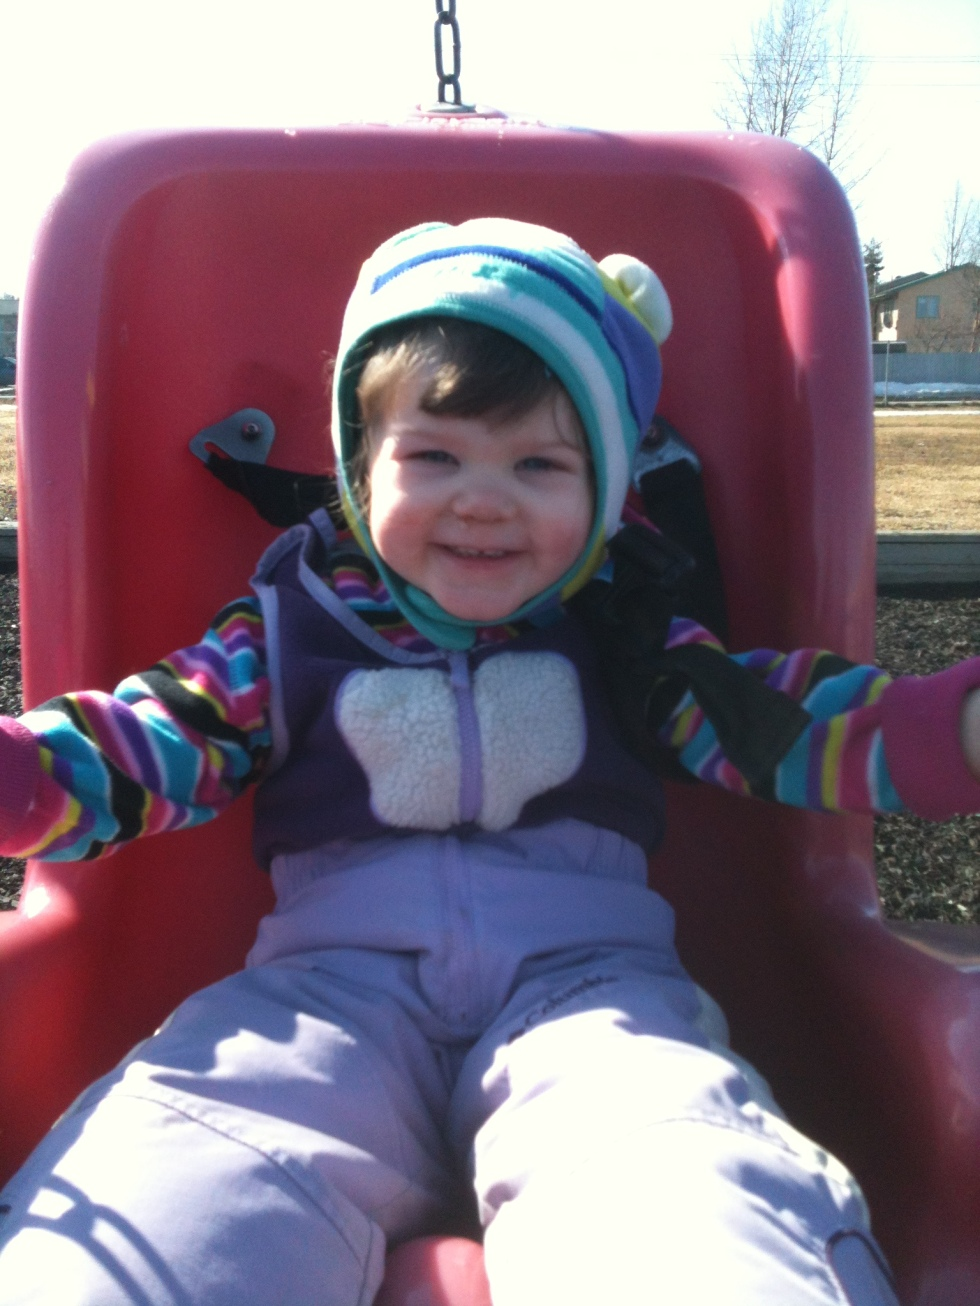 Antonia at the park